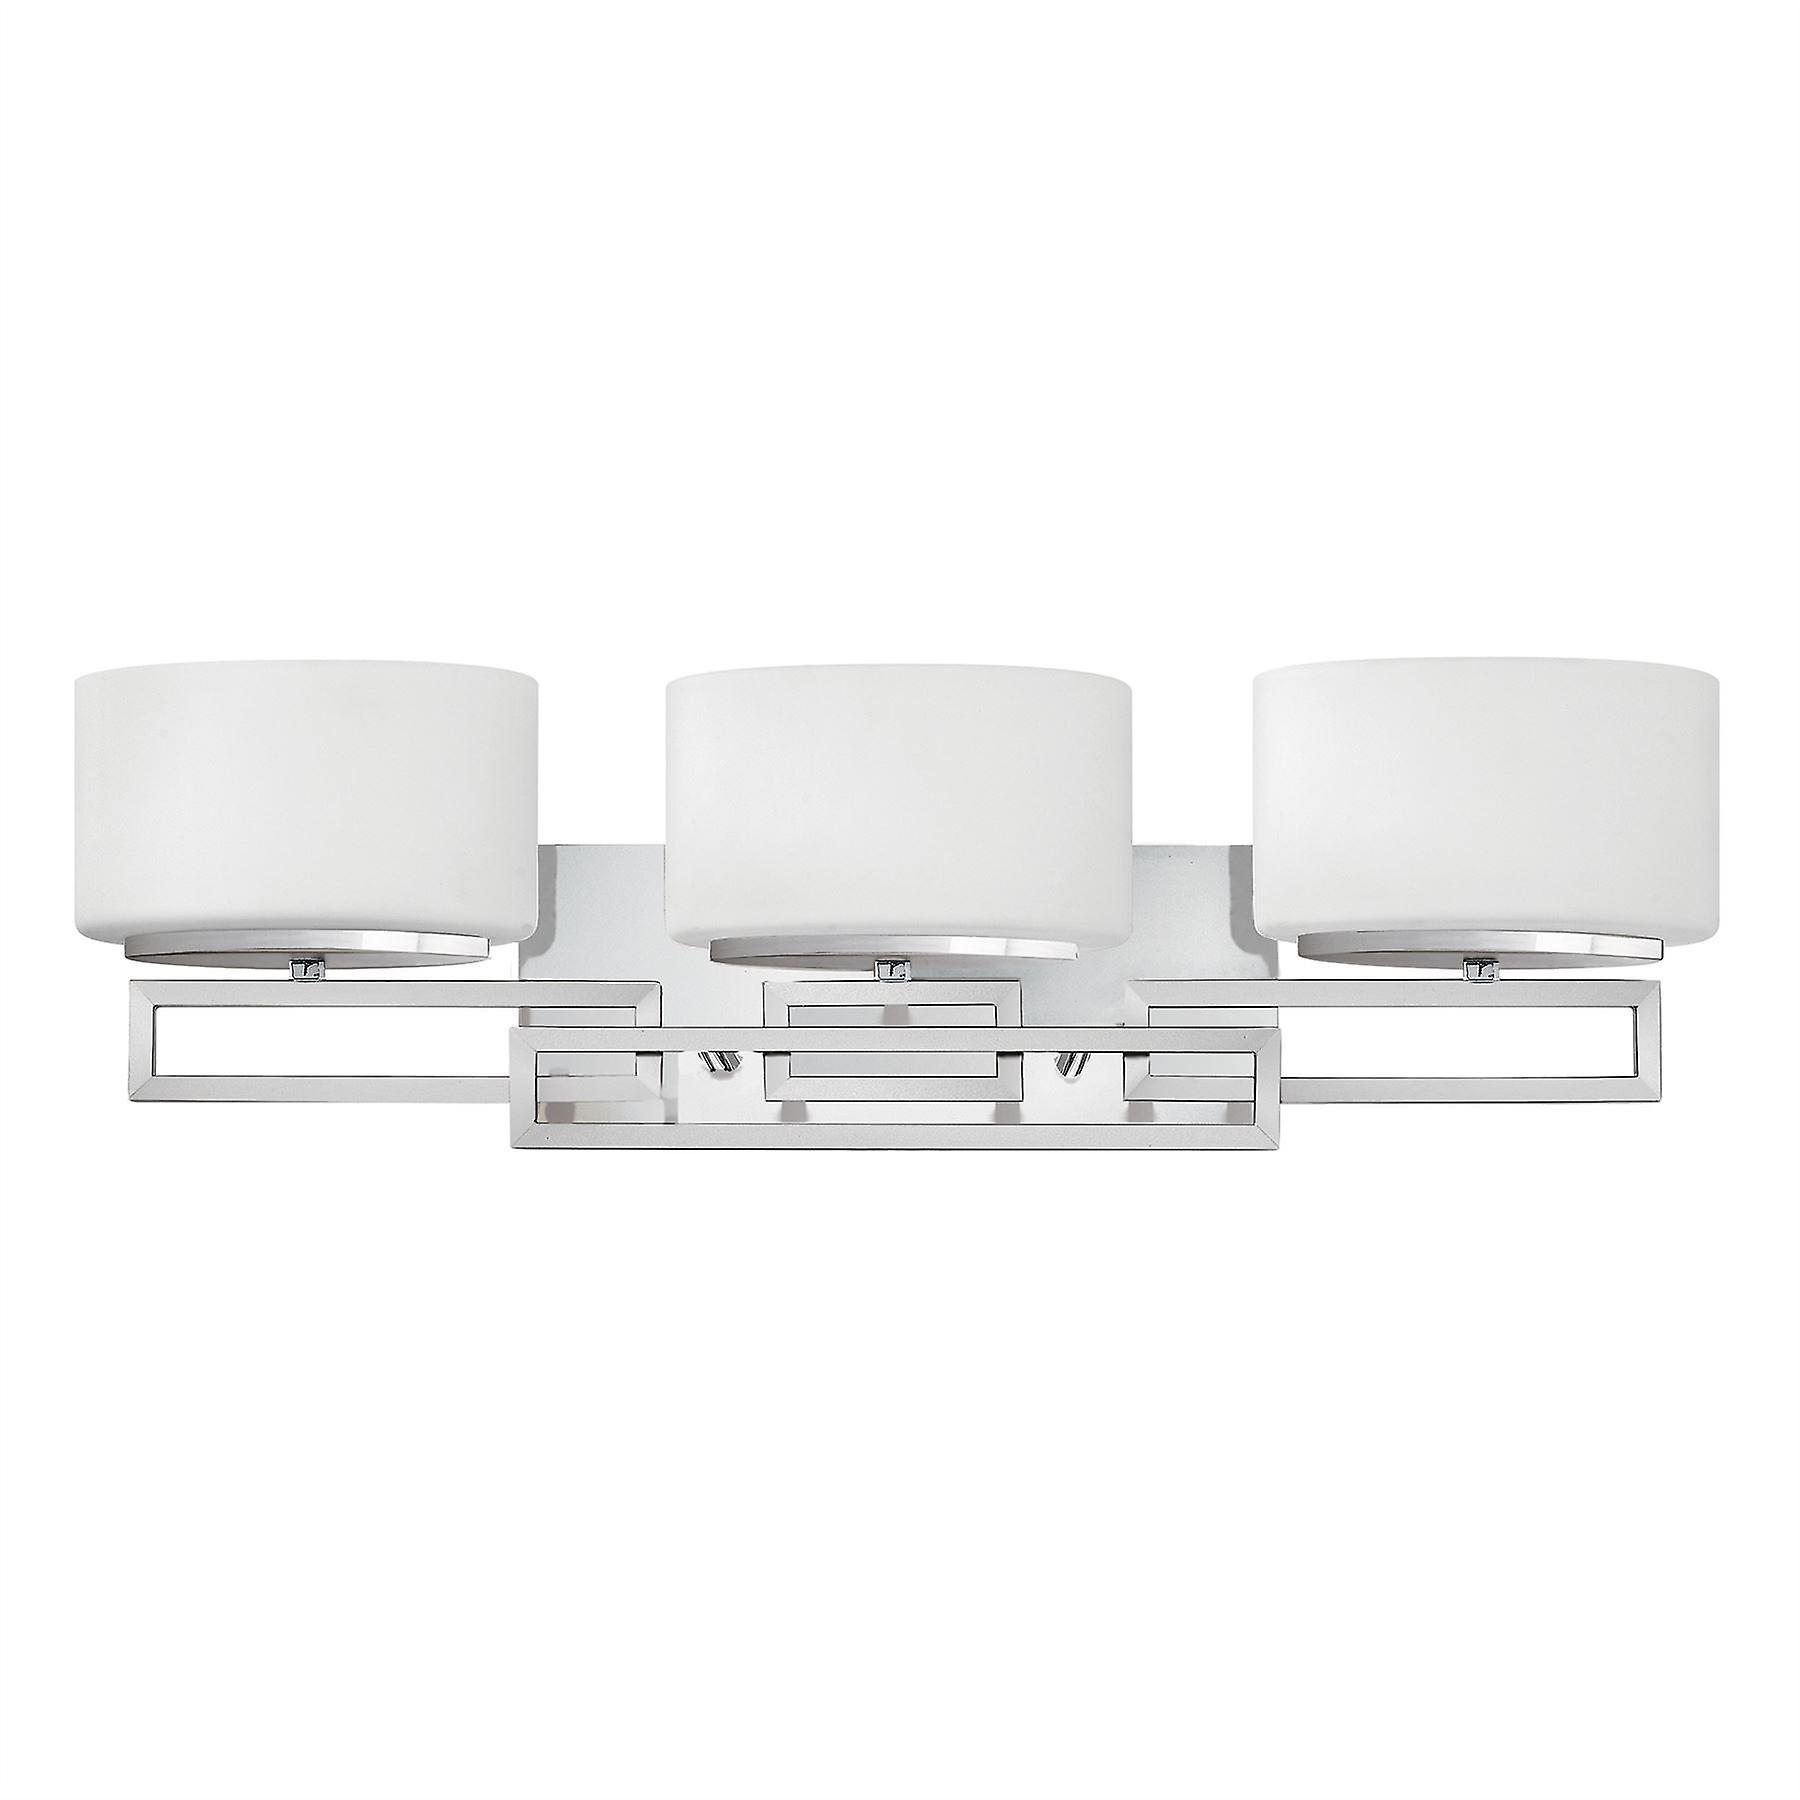 Elstead - 3 lumière Bathroom Over Mirror Wall lumière Polished Chrome IP44 - HK LANZA3 BATH